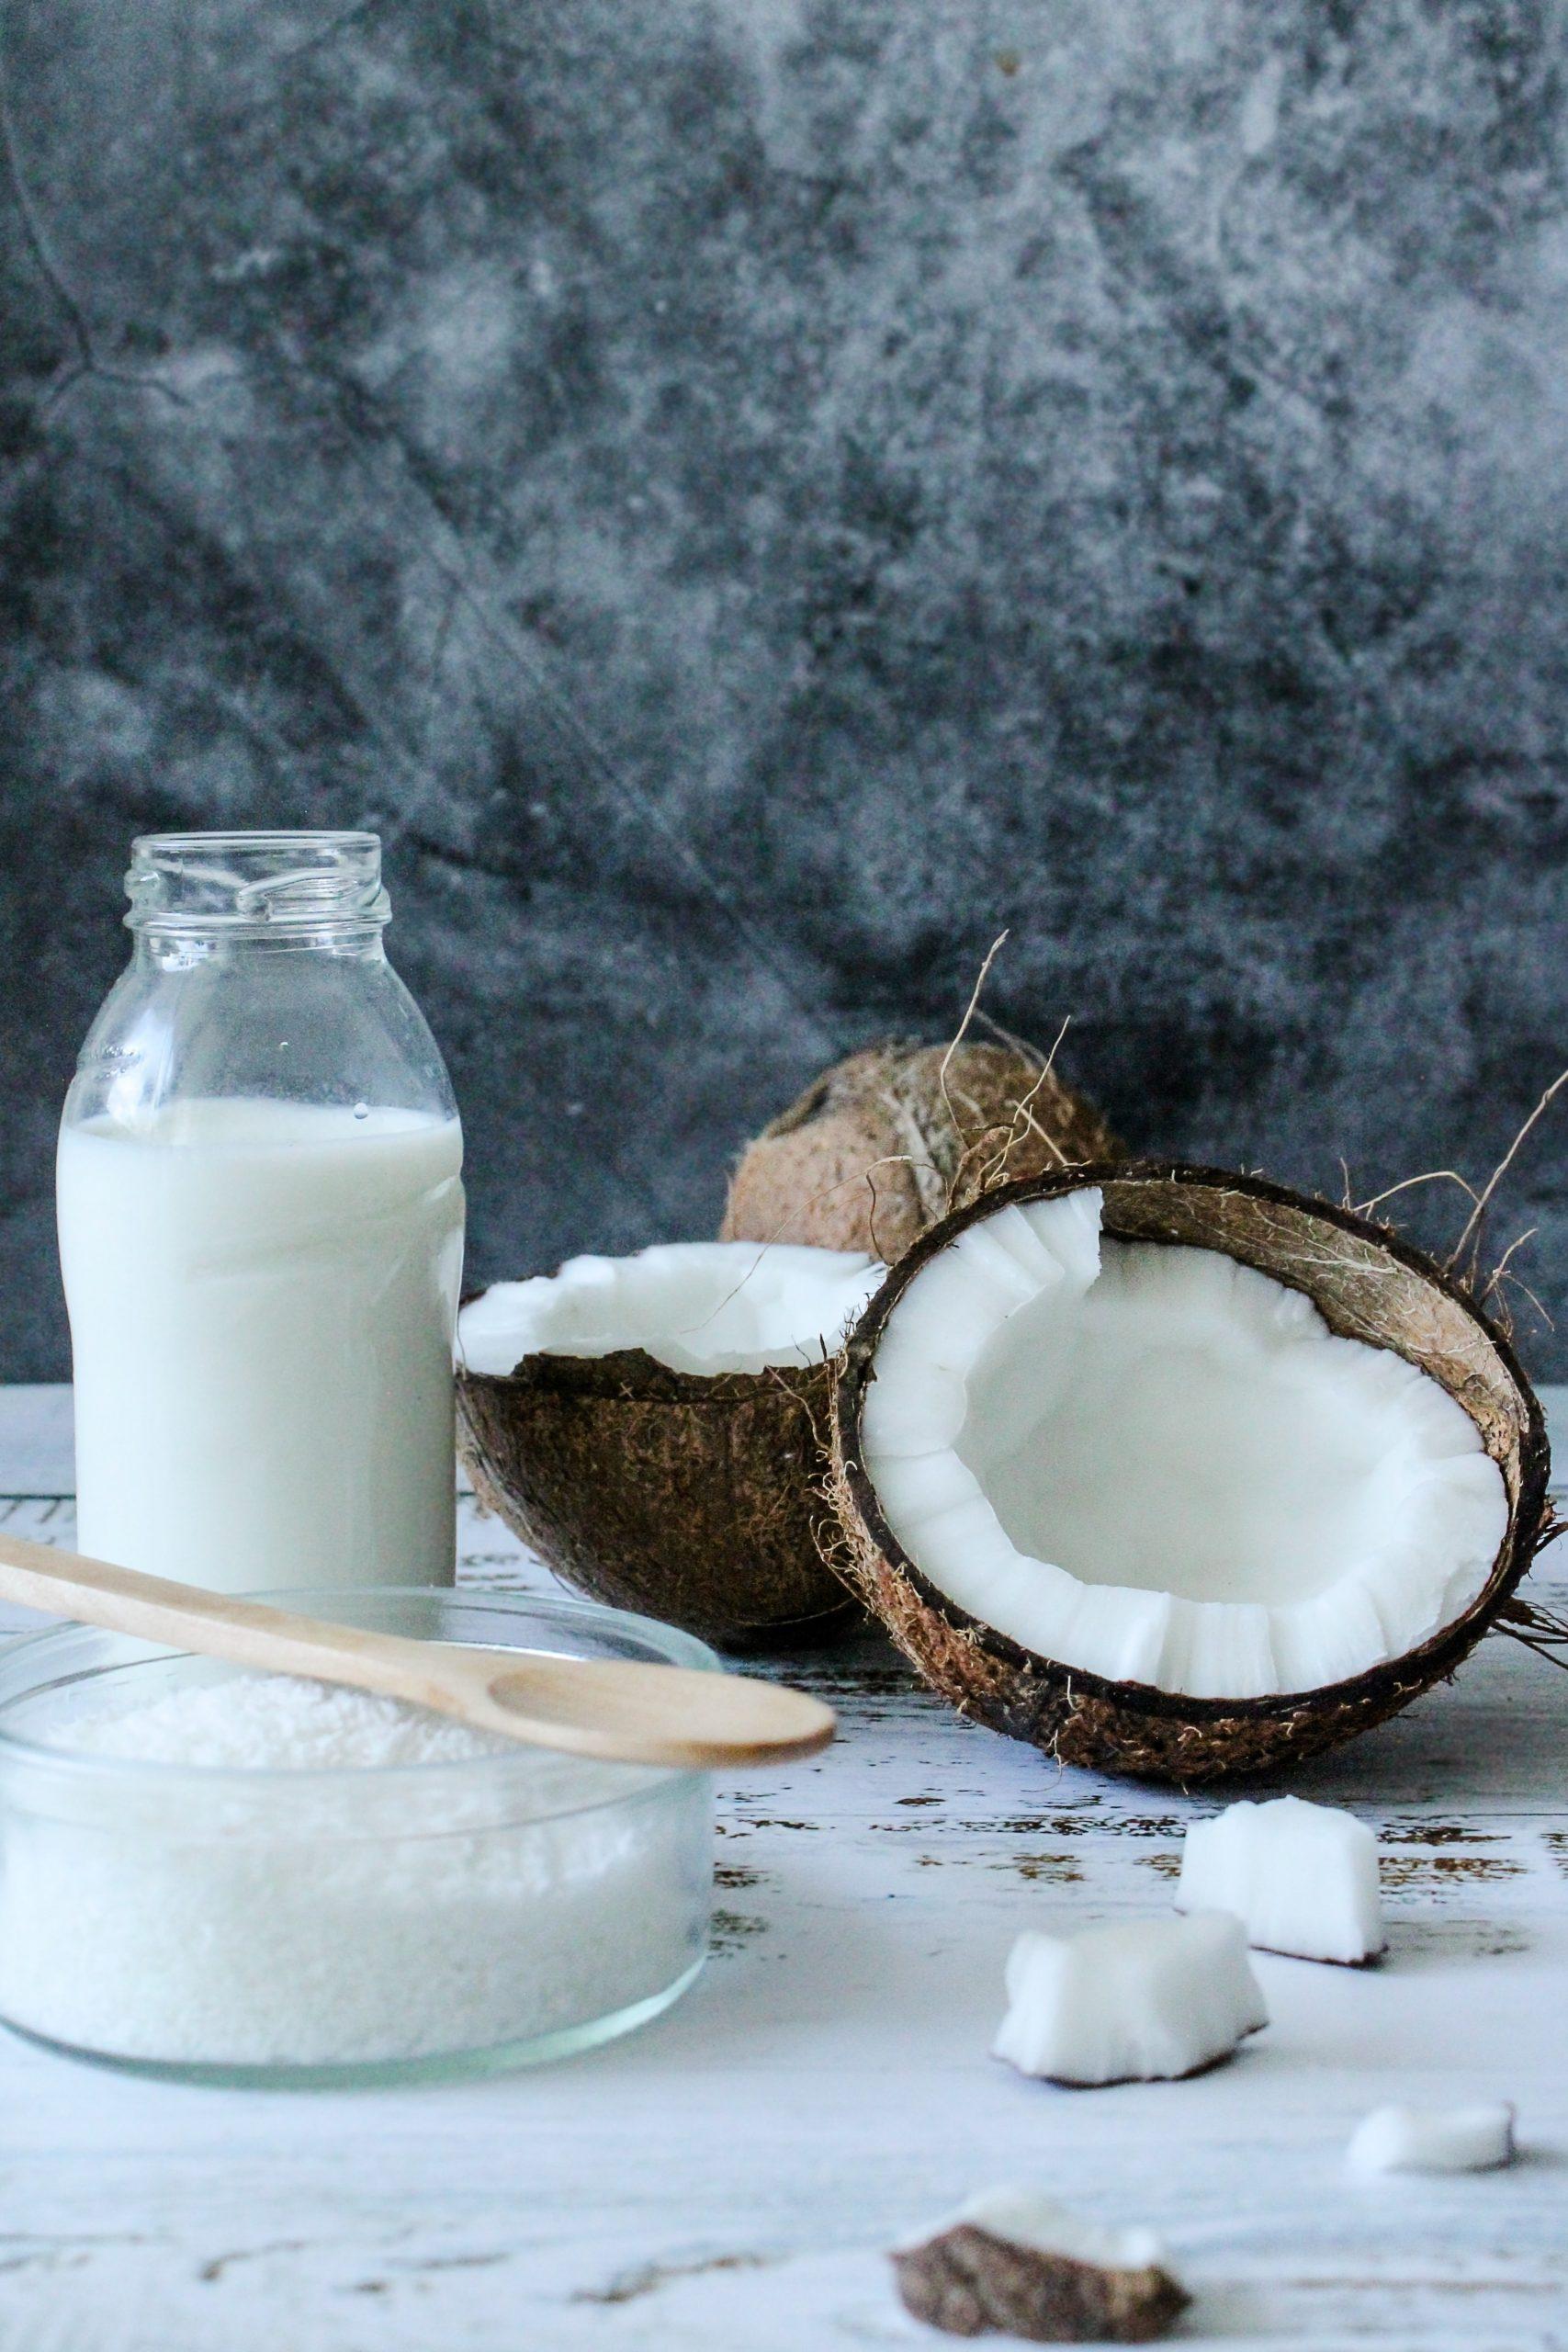 Are all milk alternatives created equally?